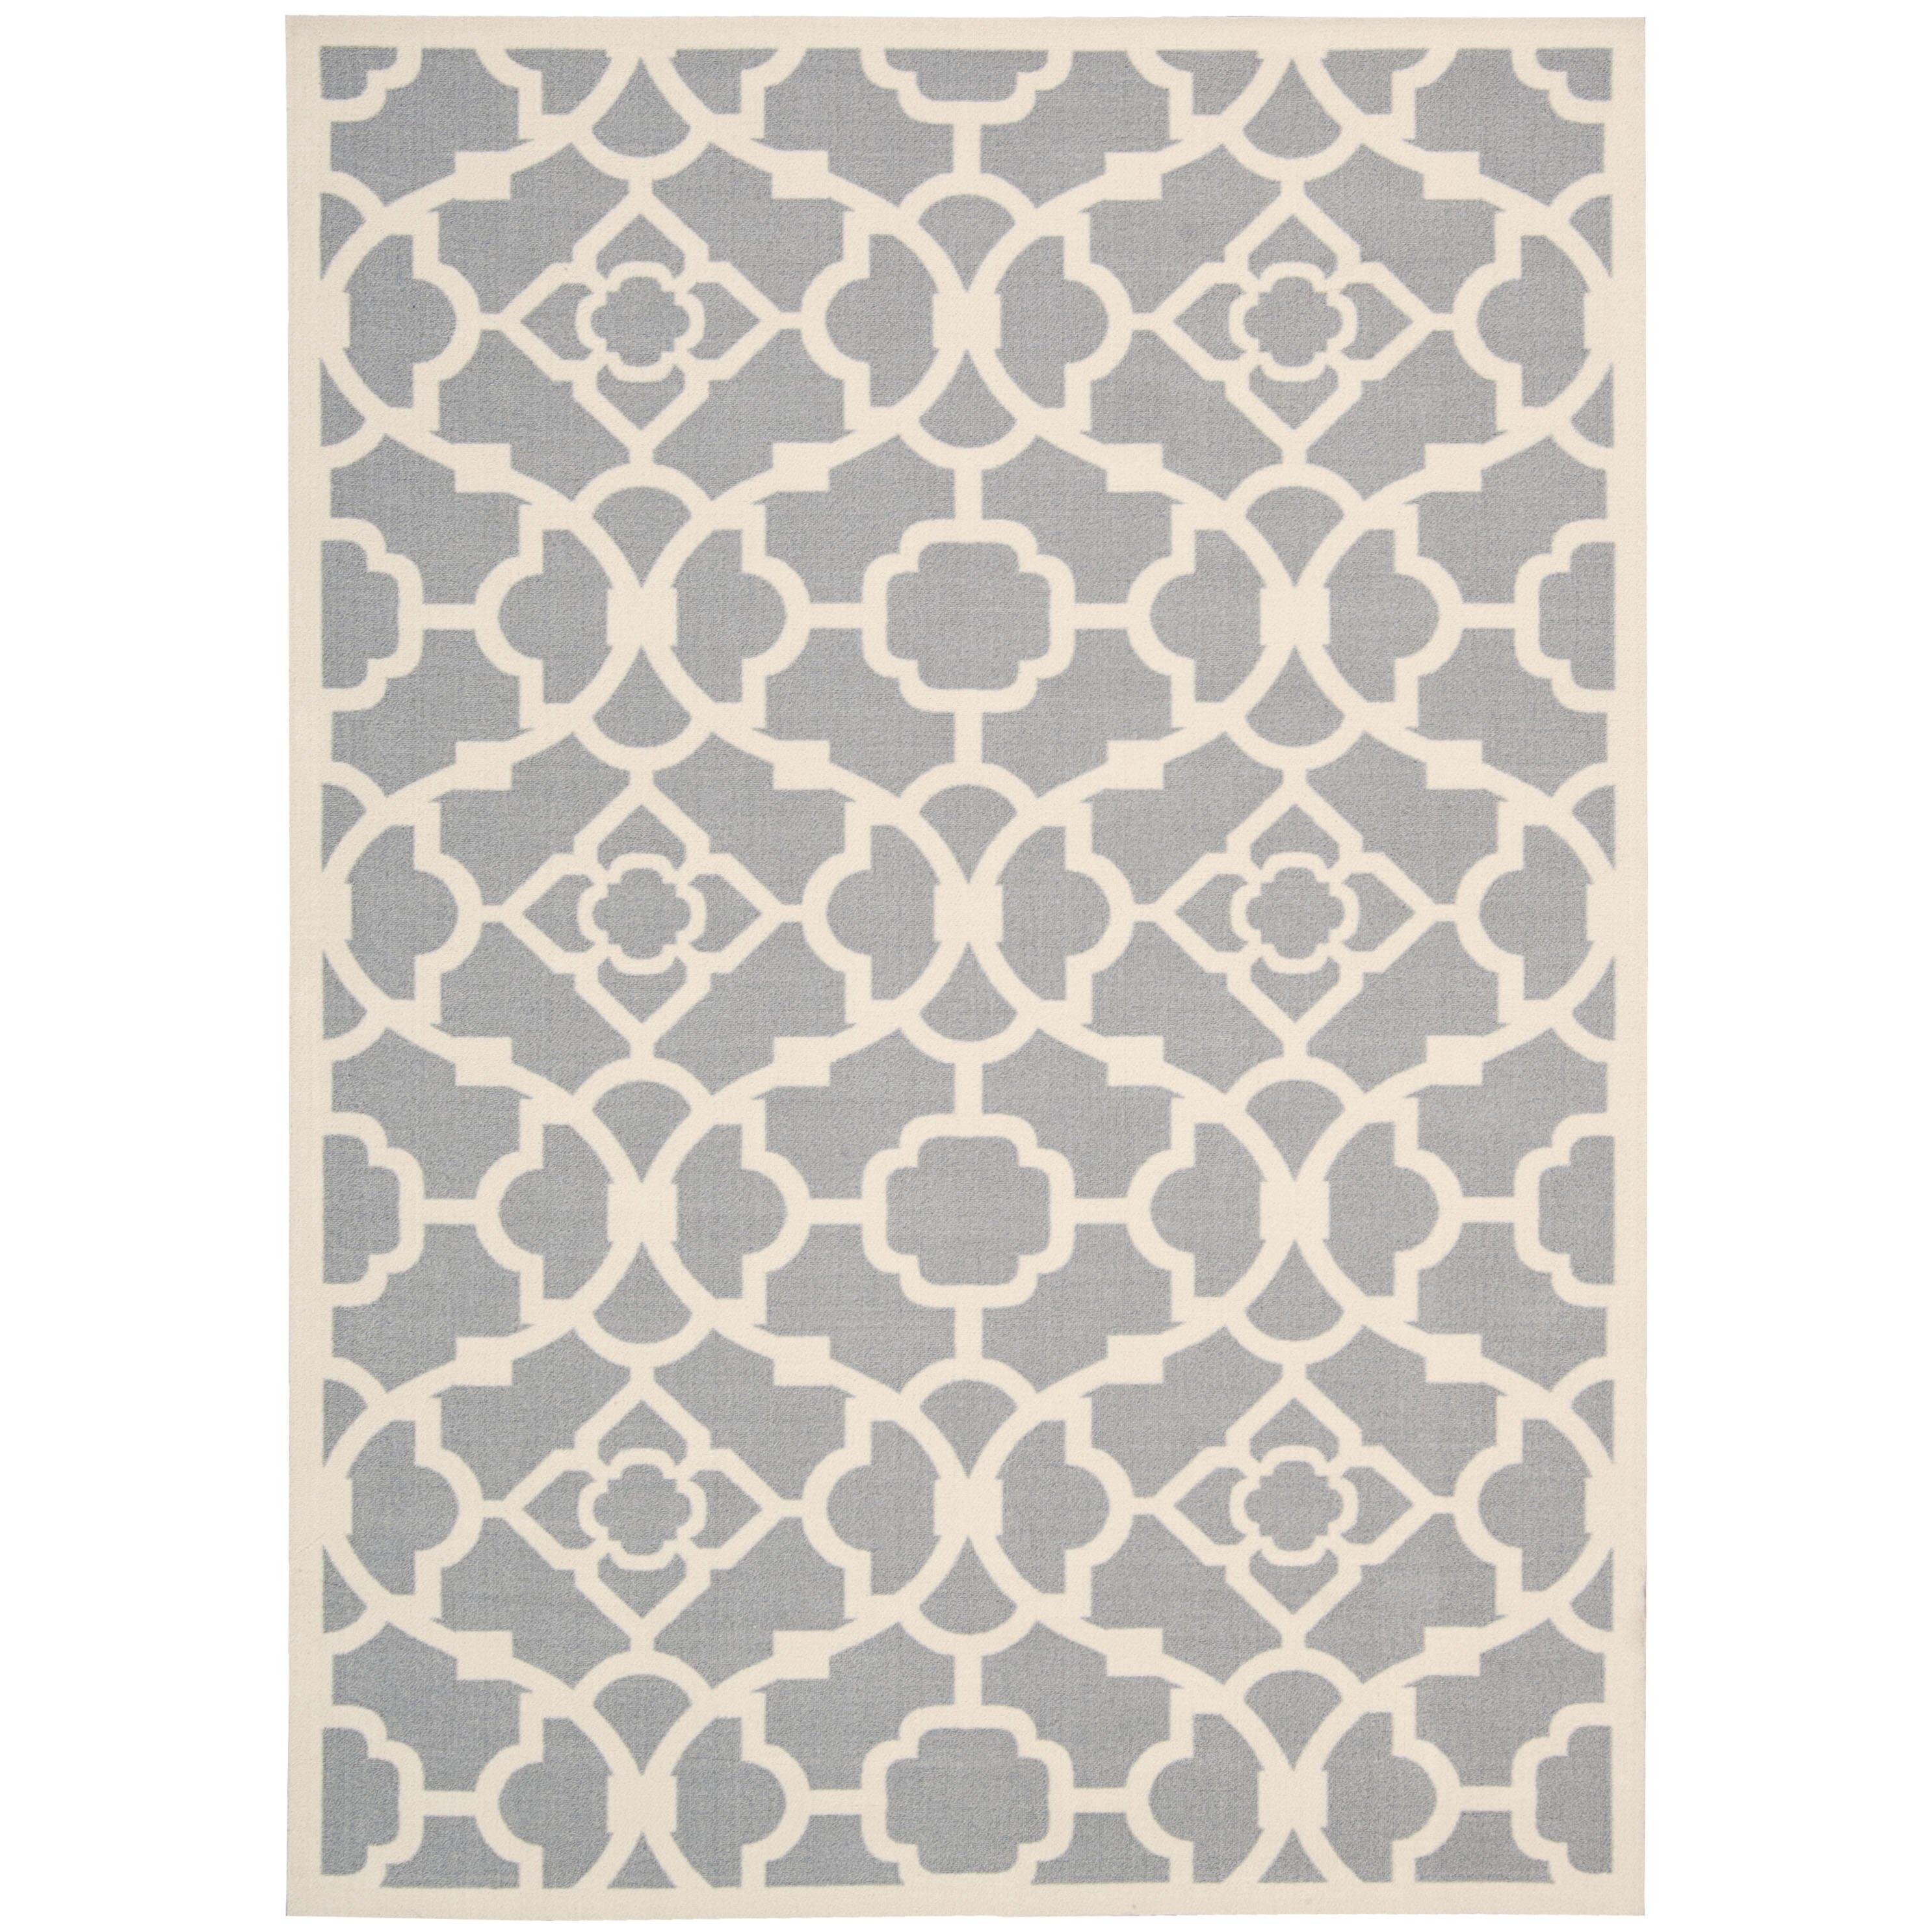 kenton gray white indoor outdoor area rug wayfair. Black Bedroom Furniture Sets. Home Design Ideas